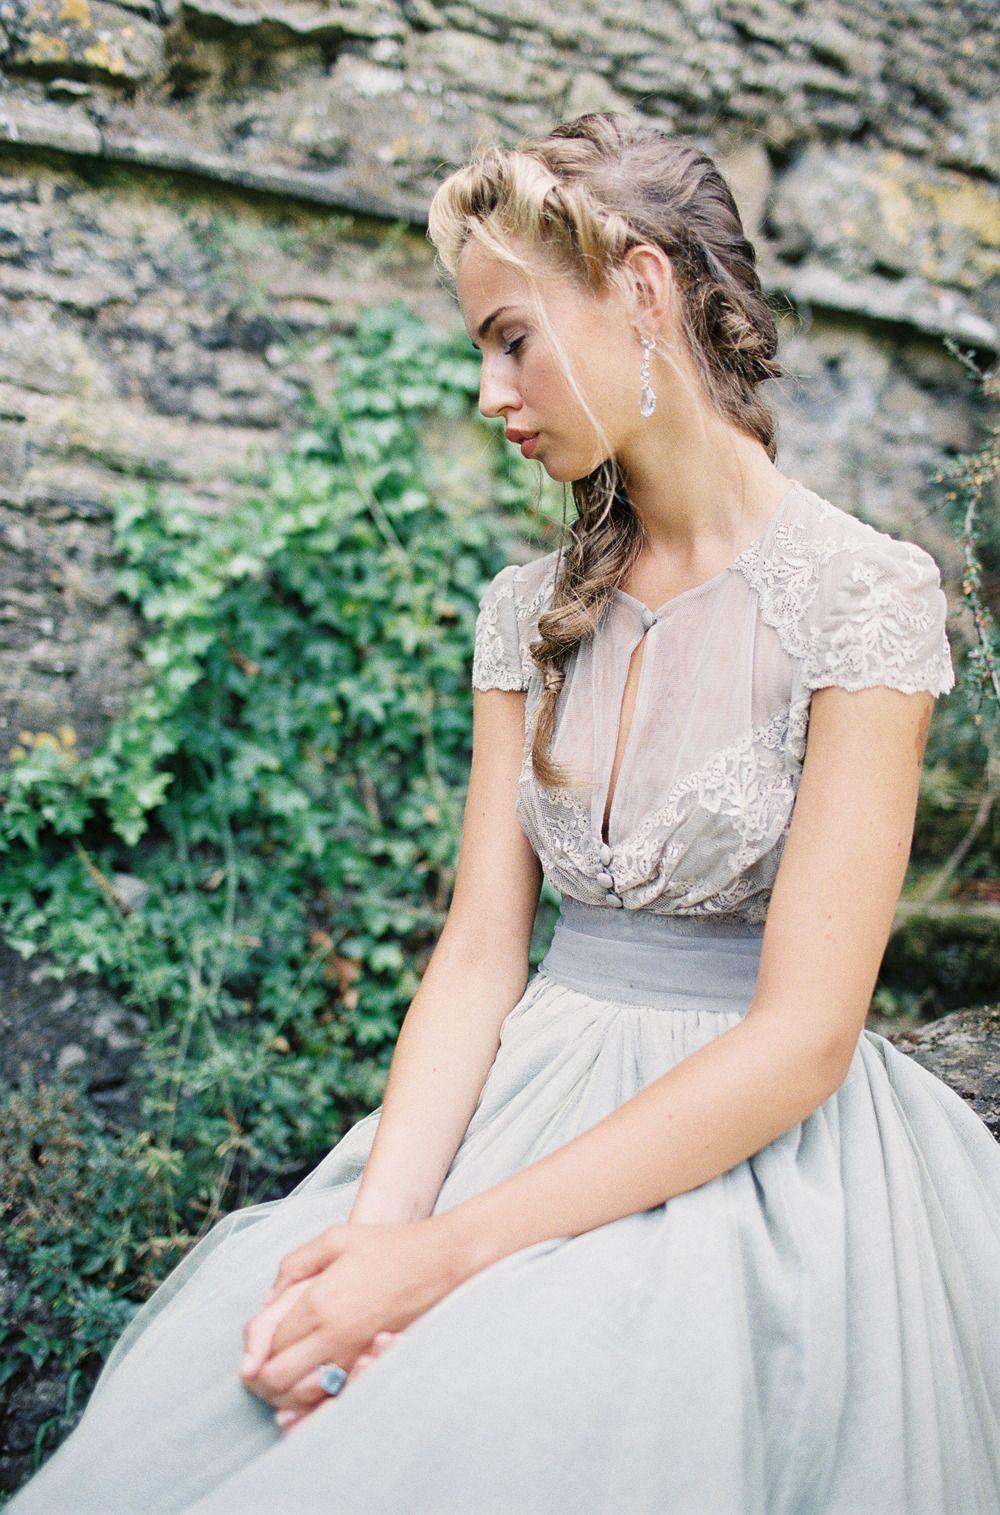 romantic grey gold wedding inspiration in 2019. Black Bedroom Furniture Sets. Home Design Ideas